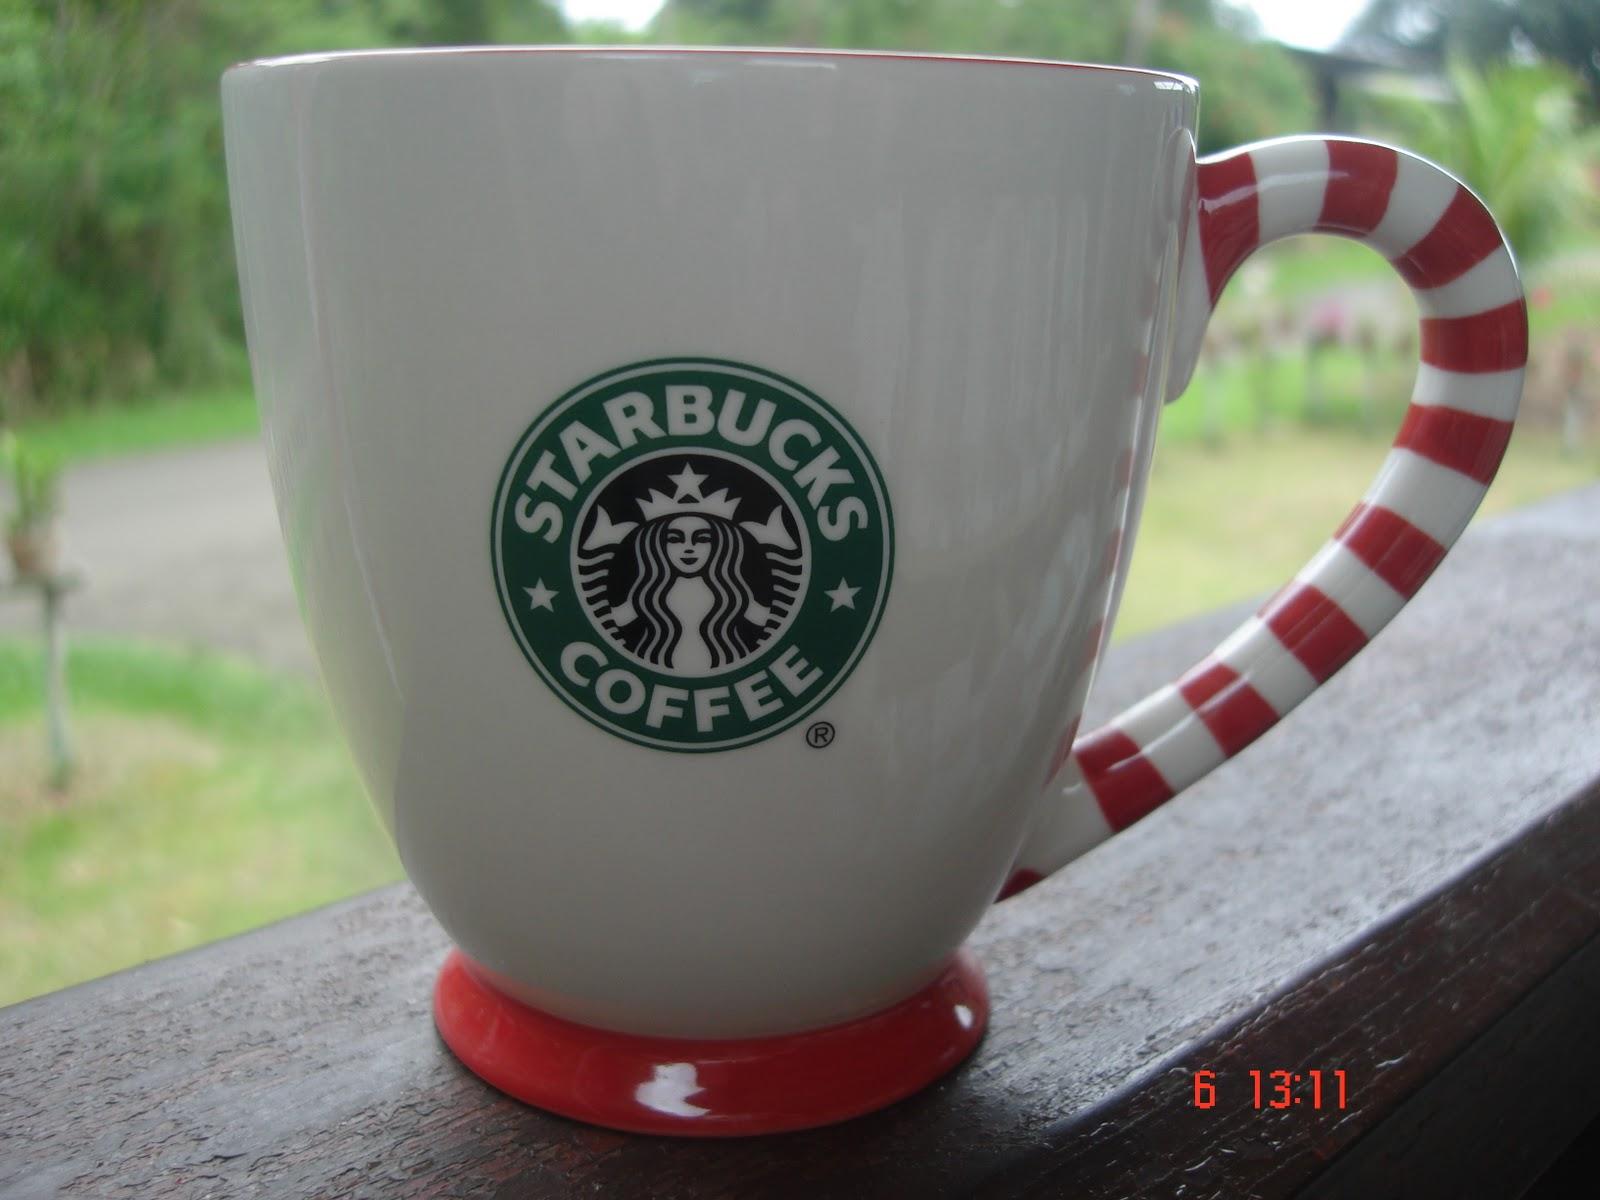 Starbucks Christmas Coffee Mugs.A Cup A Day 2008 Starbucks Christmas Holiday Candy Cane Mug